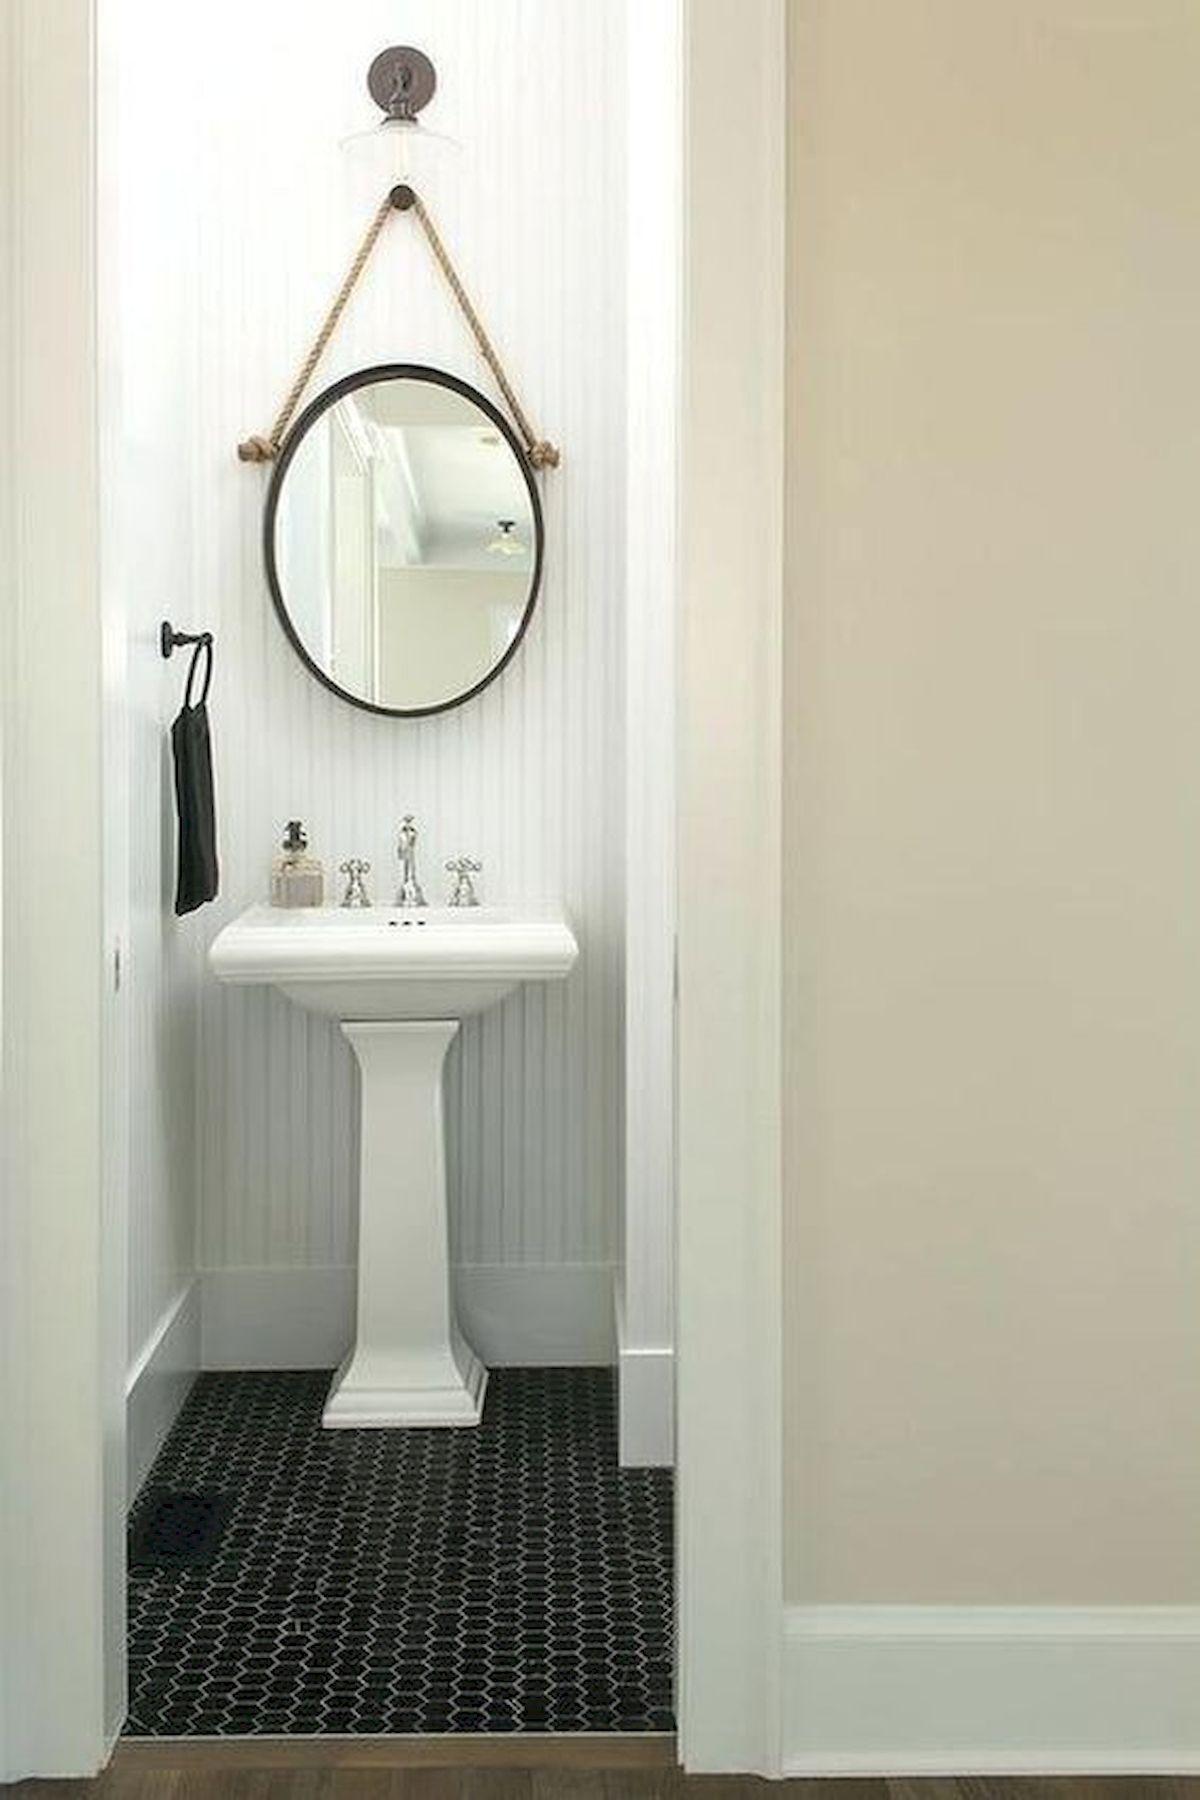 26 Easy and Creative DIY Mirror Ideas To Decorate Your Bathroom (19)